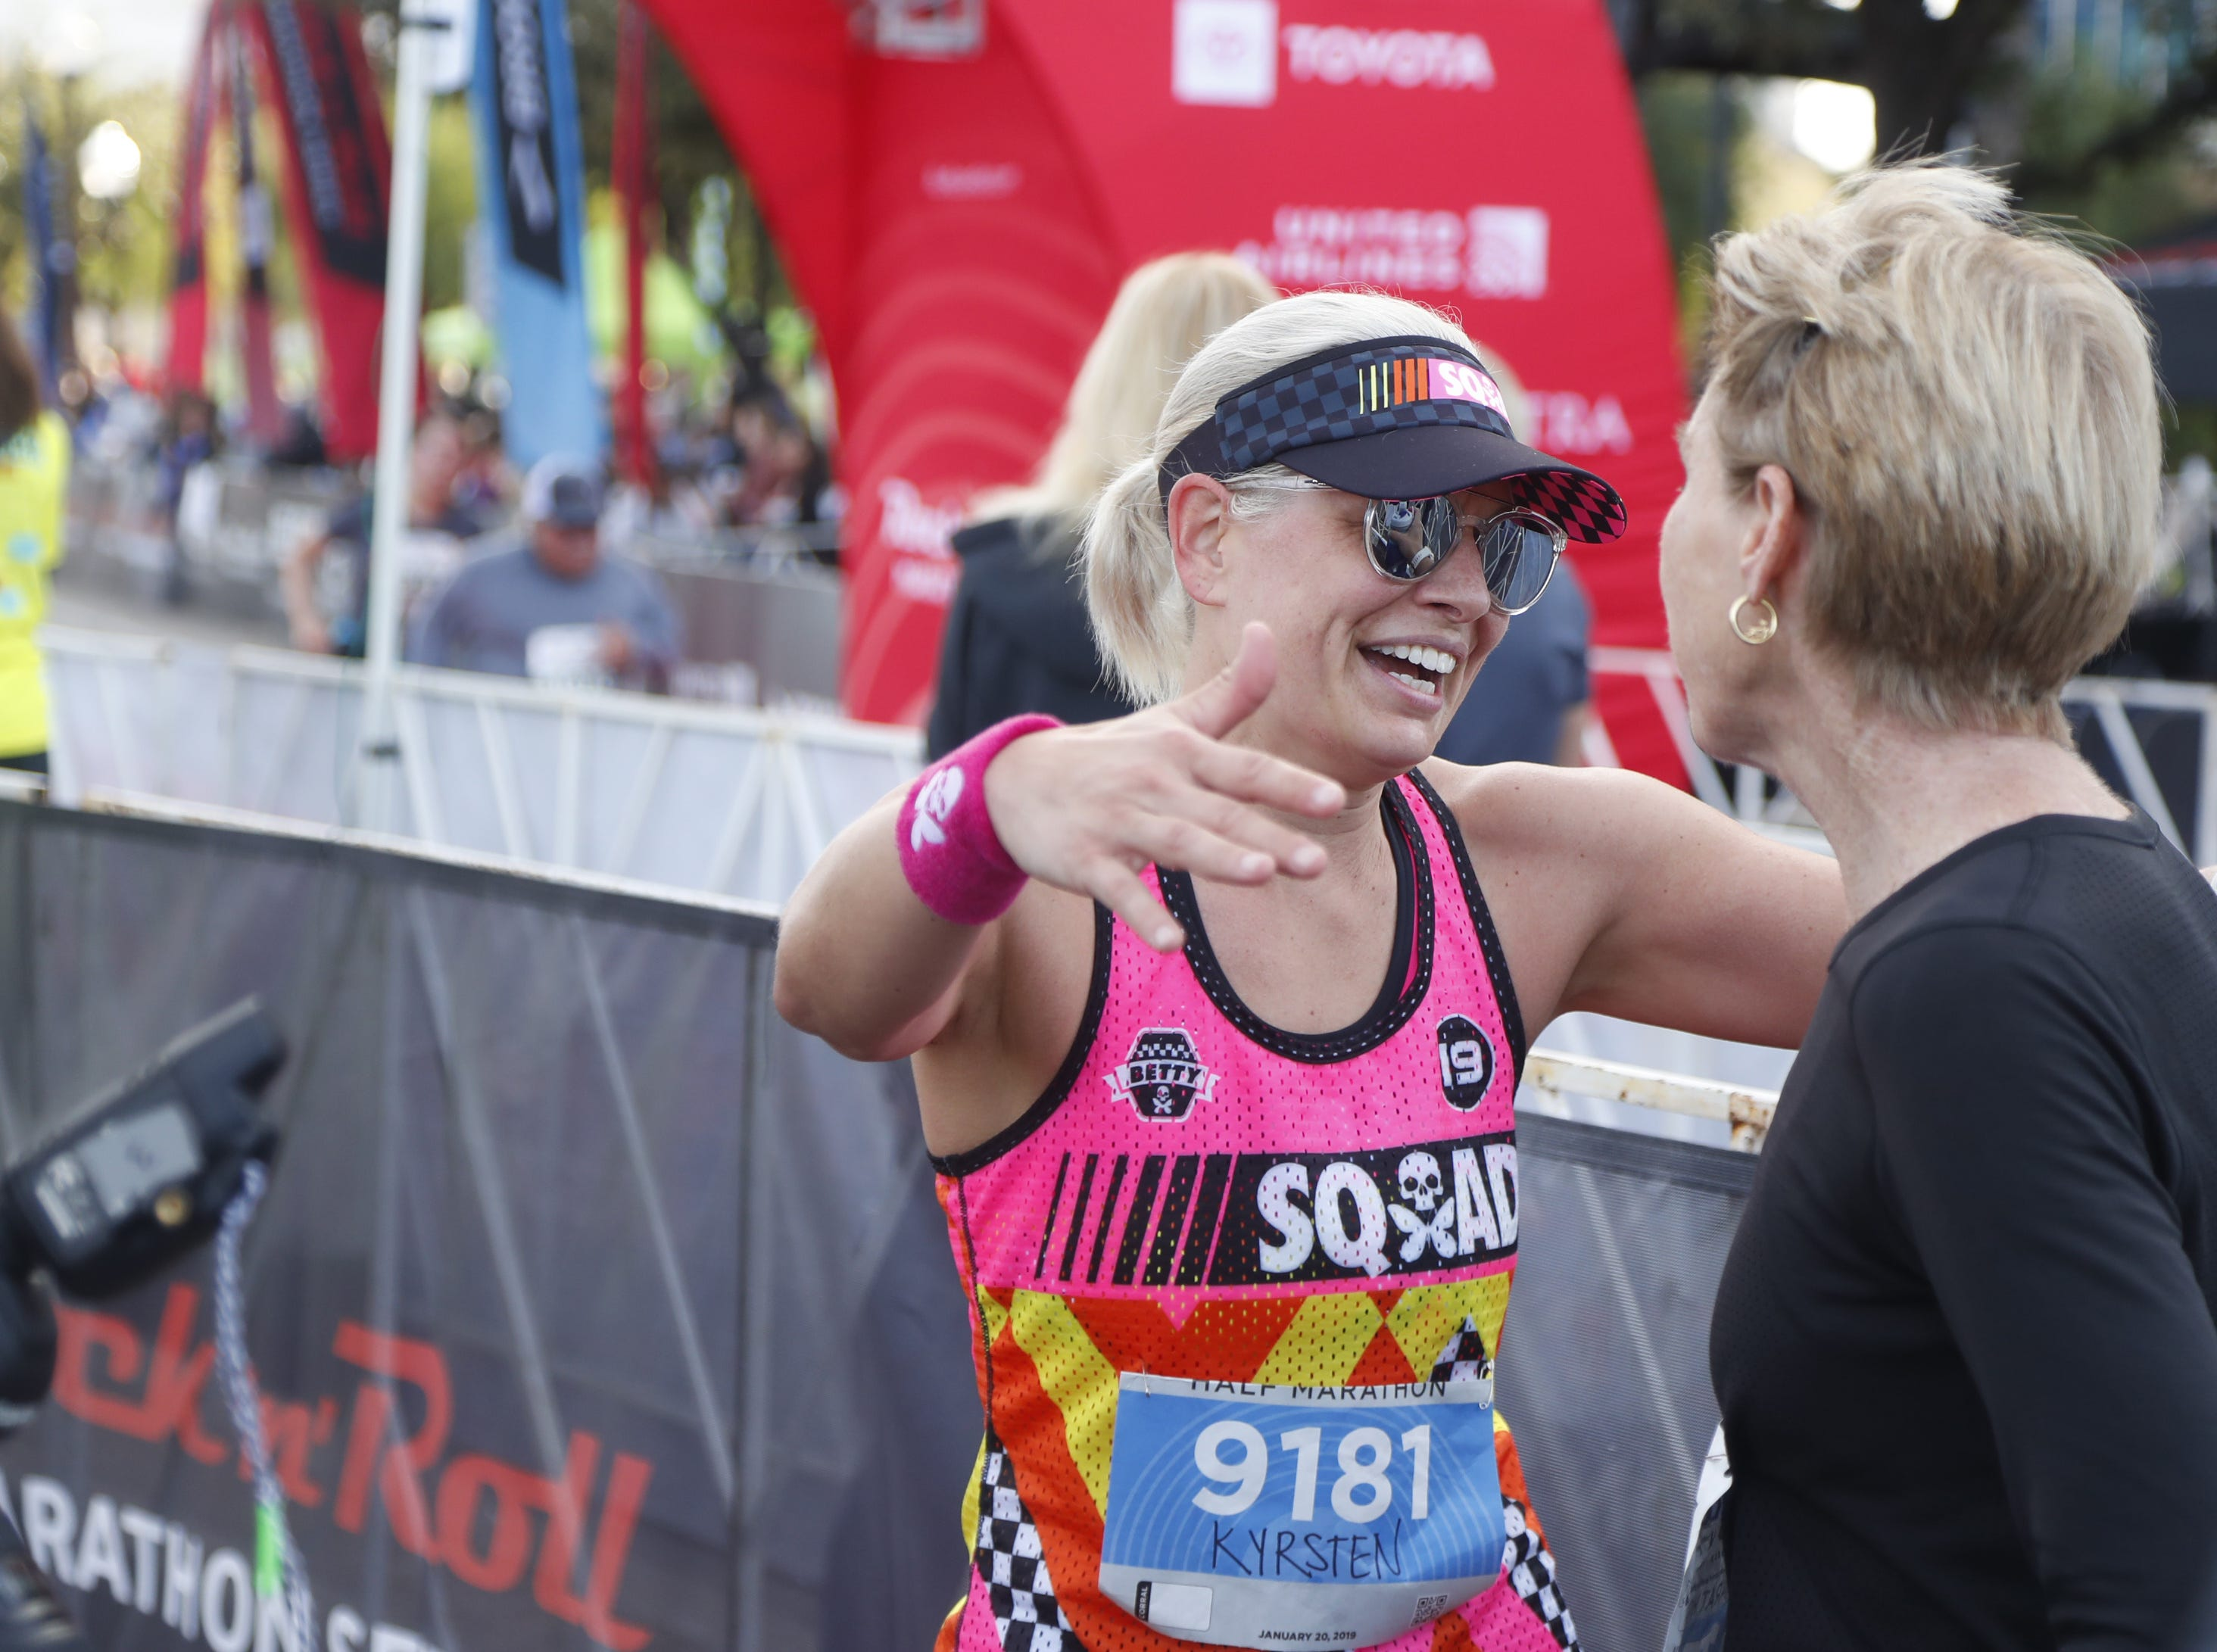 Sen. Kyrsten Sinema hugs Paula Newby-Fraser after Sinema finished the Rock 'N' Roll half-marathon in Tempe on Jan. 20, 2019.